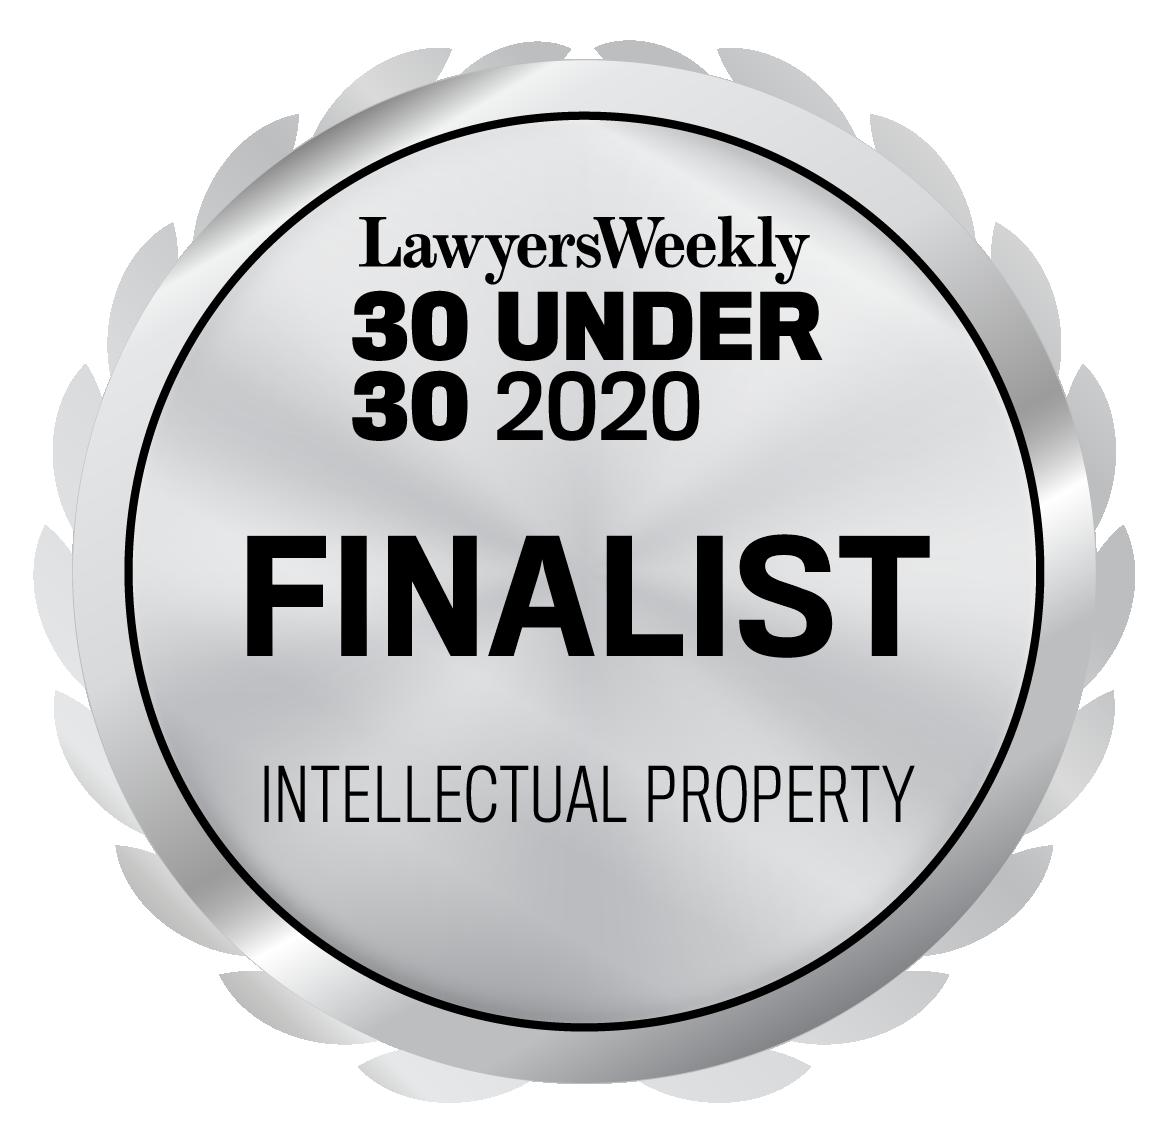 30 Under 30 Awards - Intellectual Property - Finalist - 2020